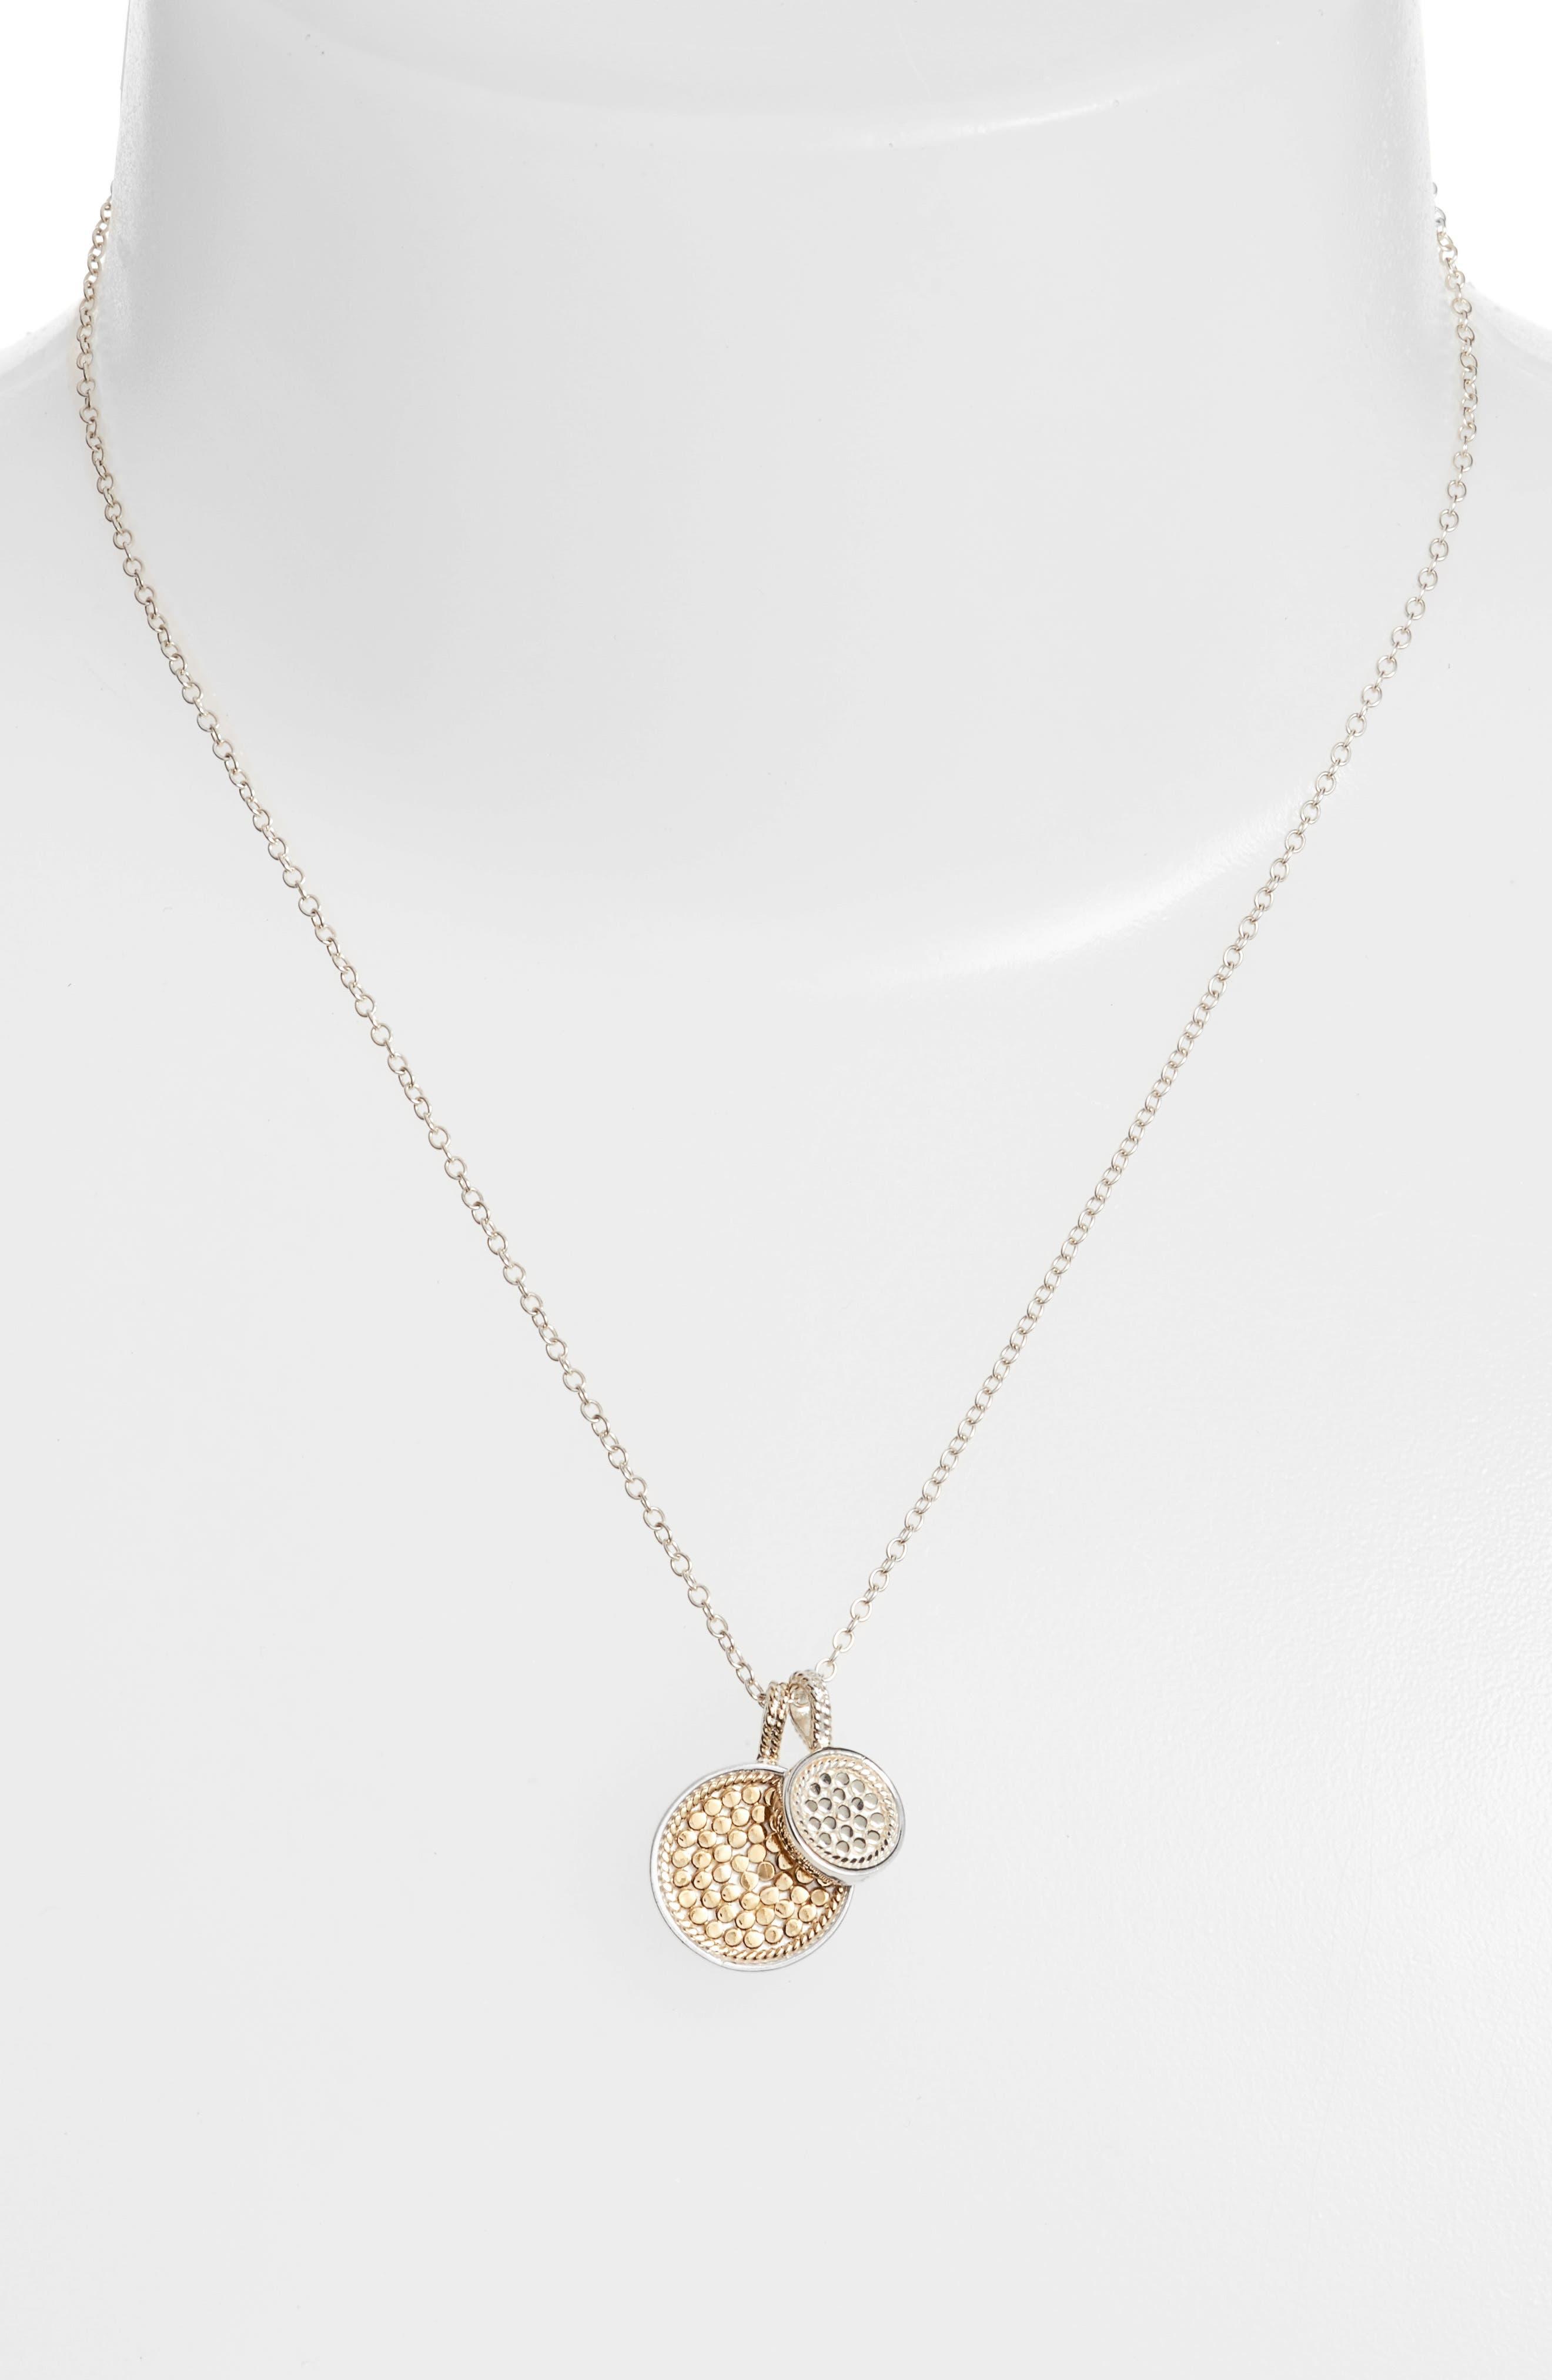 Reversible Disc Pendant Necklace,                         Main,                         color, Gold/ Silver